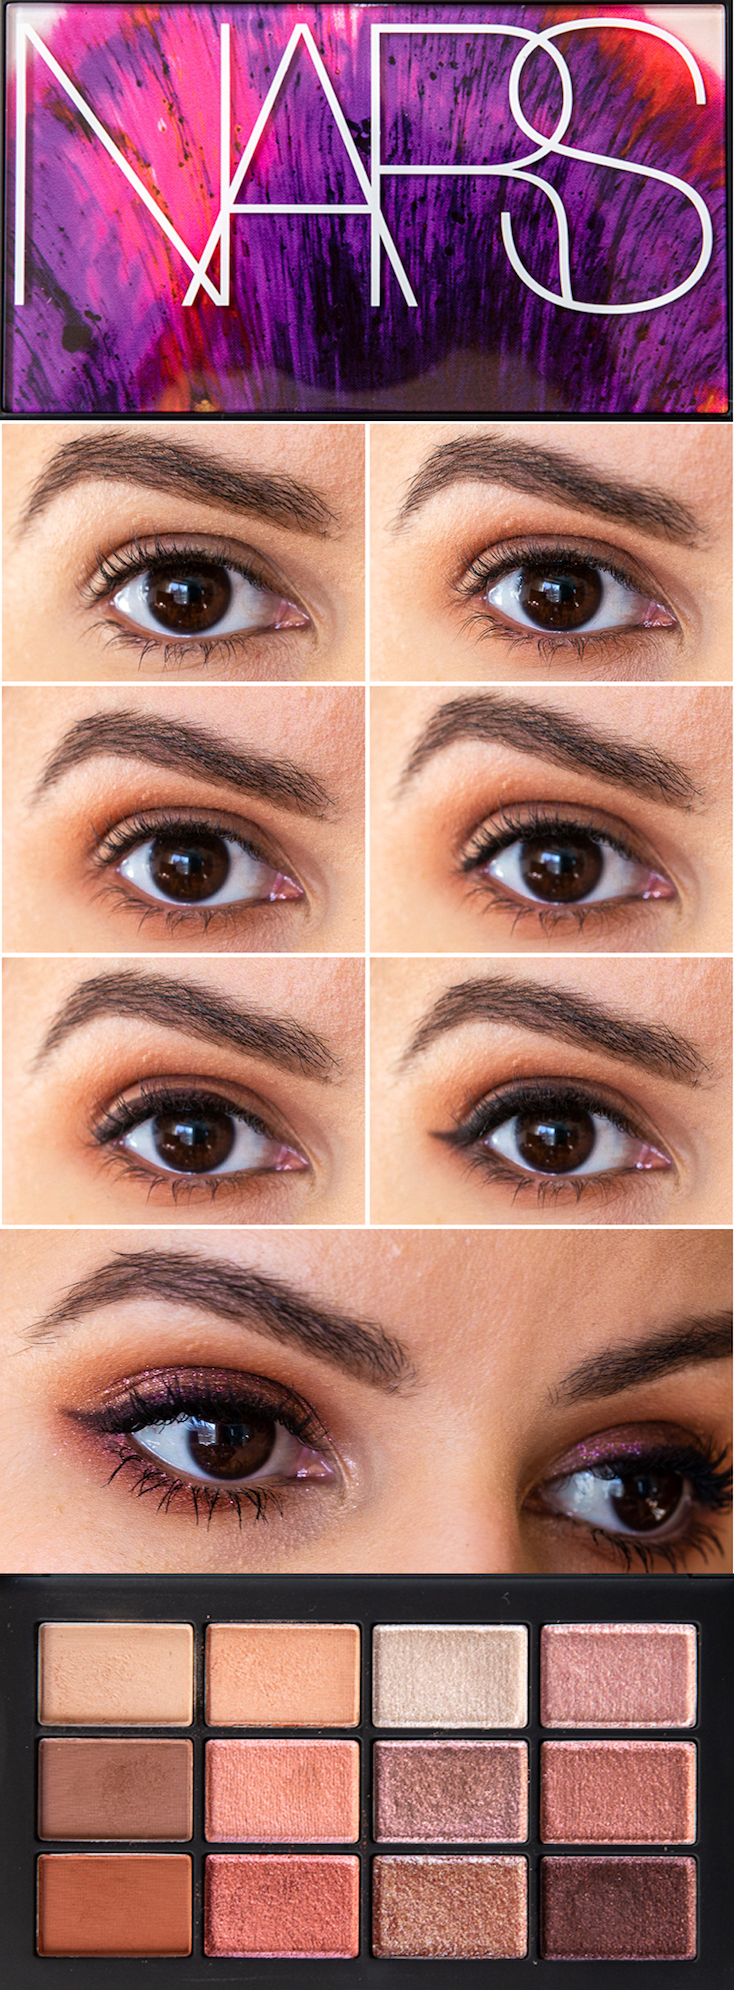 pinterest @woahstyle - NARS ignited eye shadow palette review tutorial.jpg